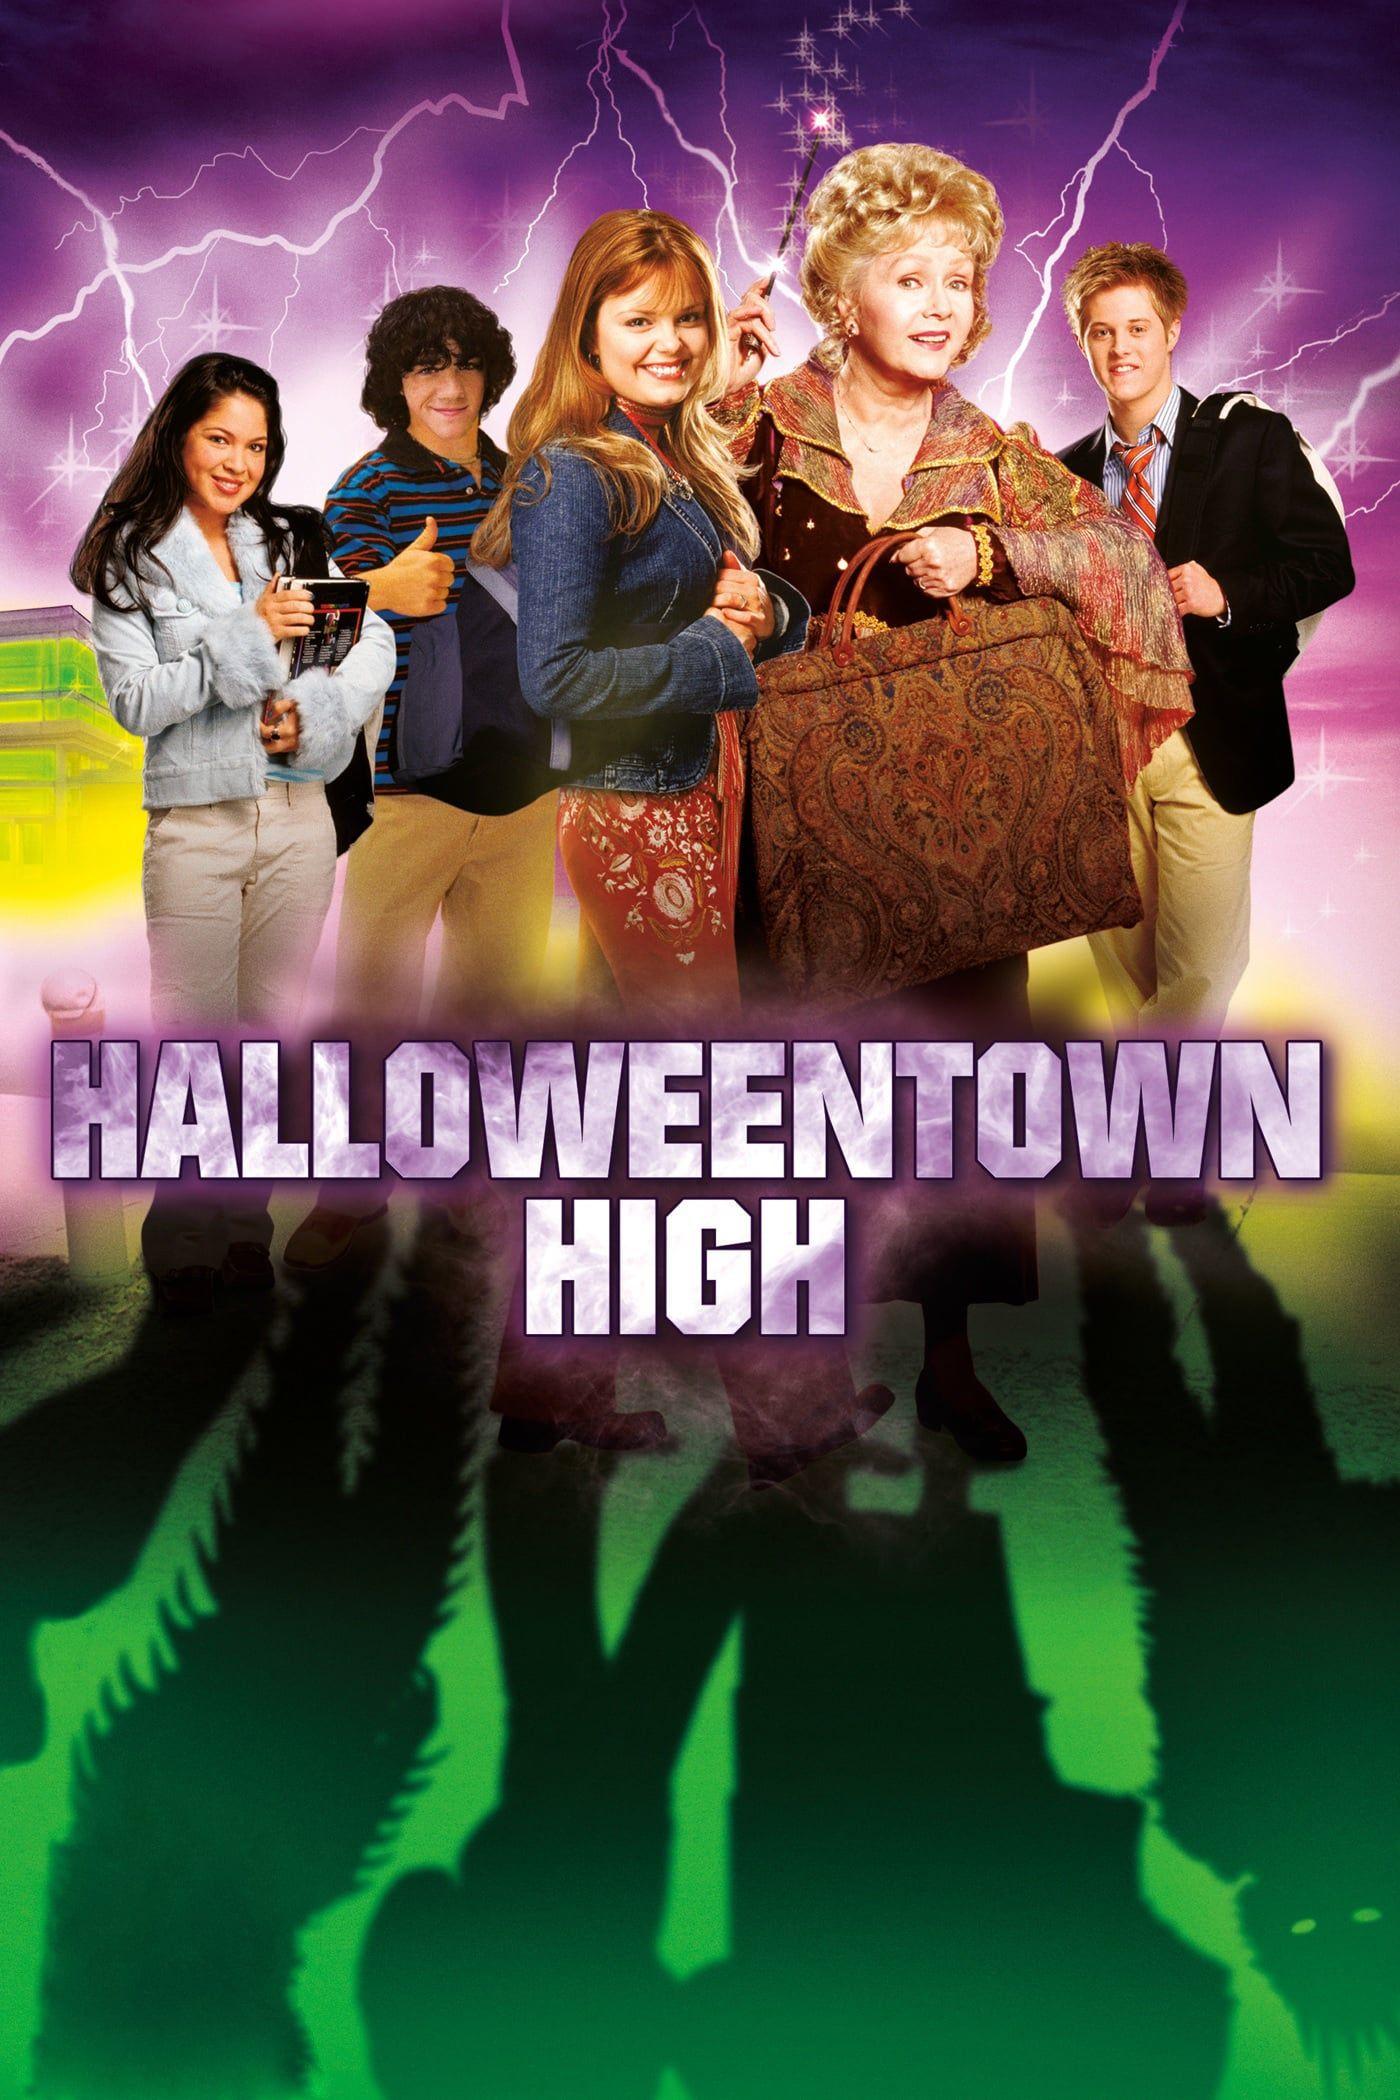 Ver Hd Online Halloweentown High P E L I C U L A Completa Espanol Latino Hd 1080p Ultrape Halloweentown High Best Halloween Movies Disney Halloween Movies